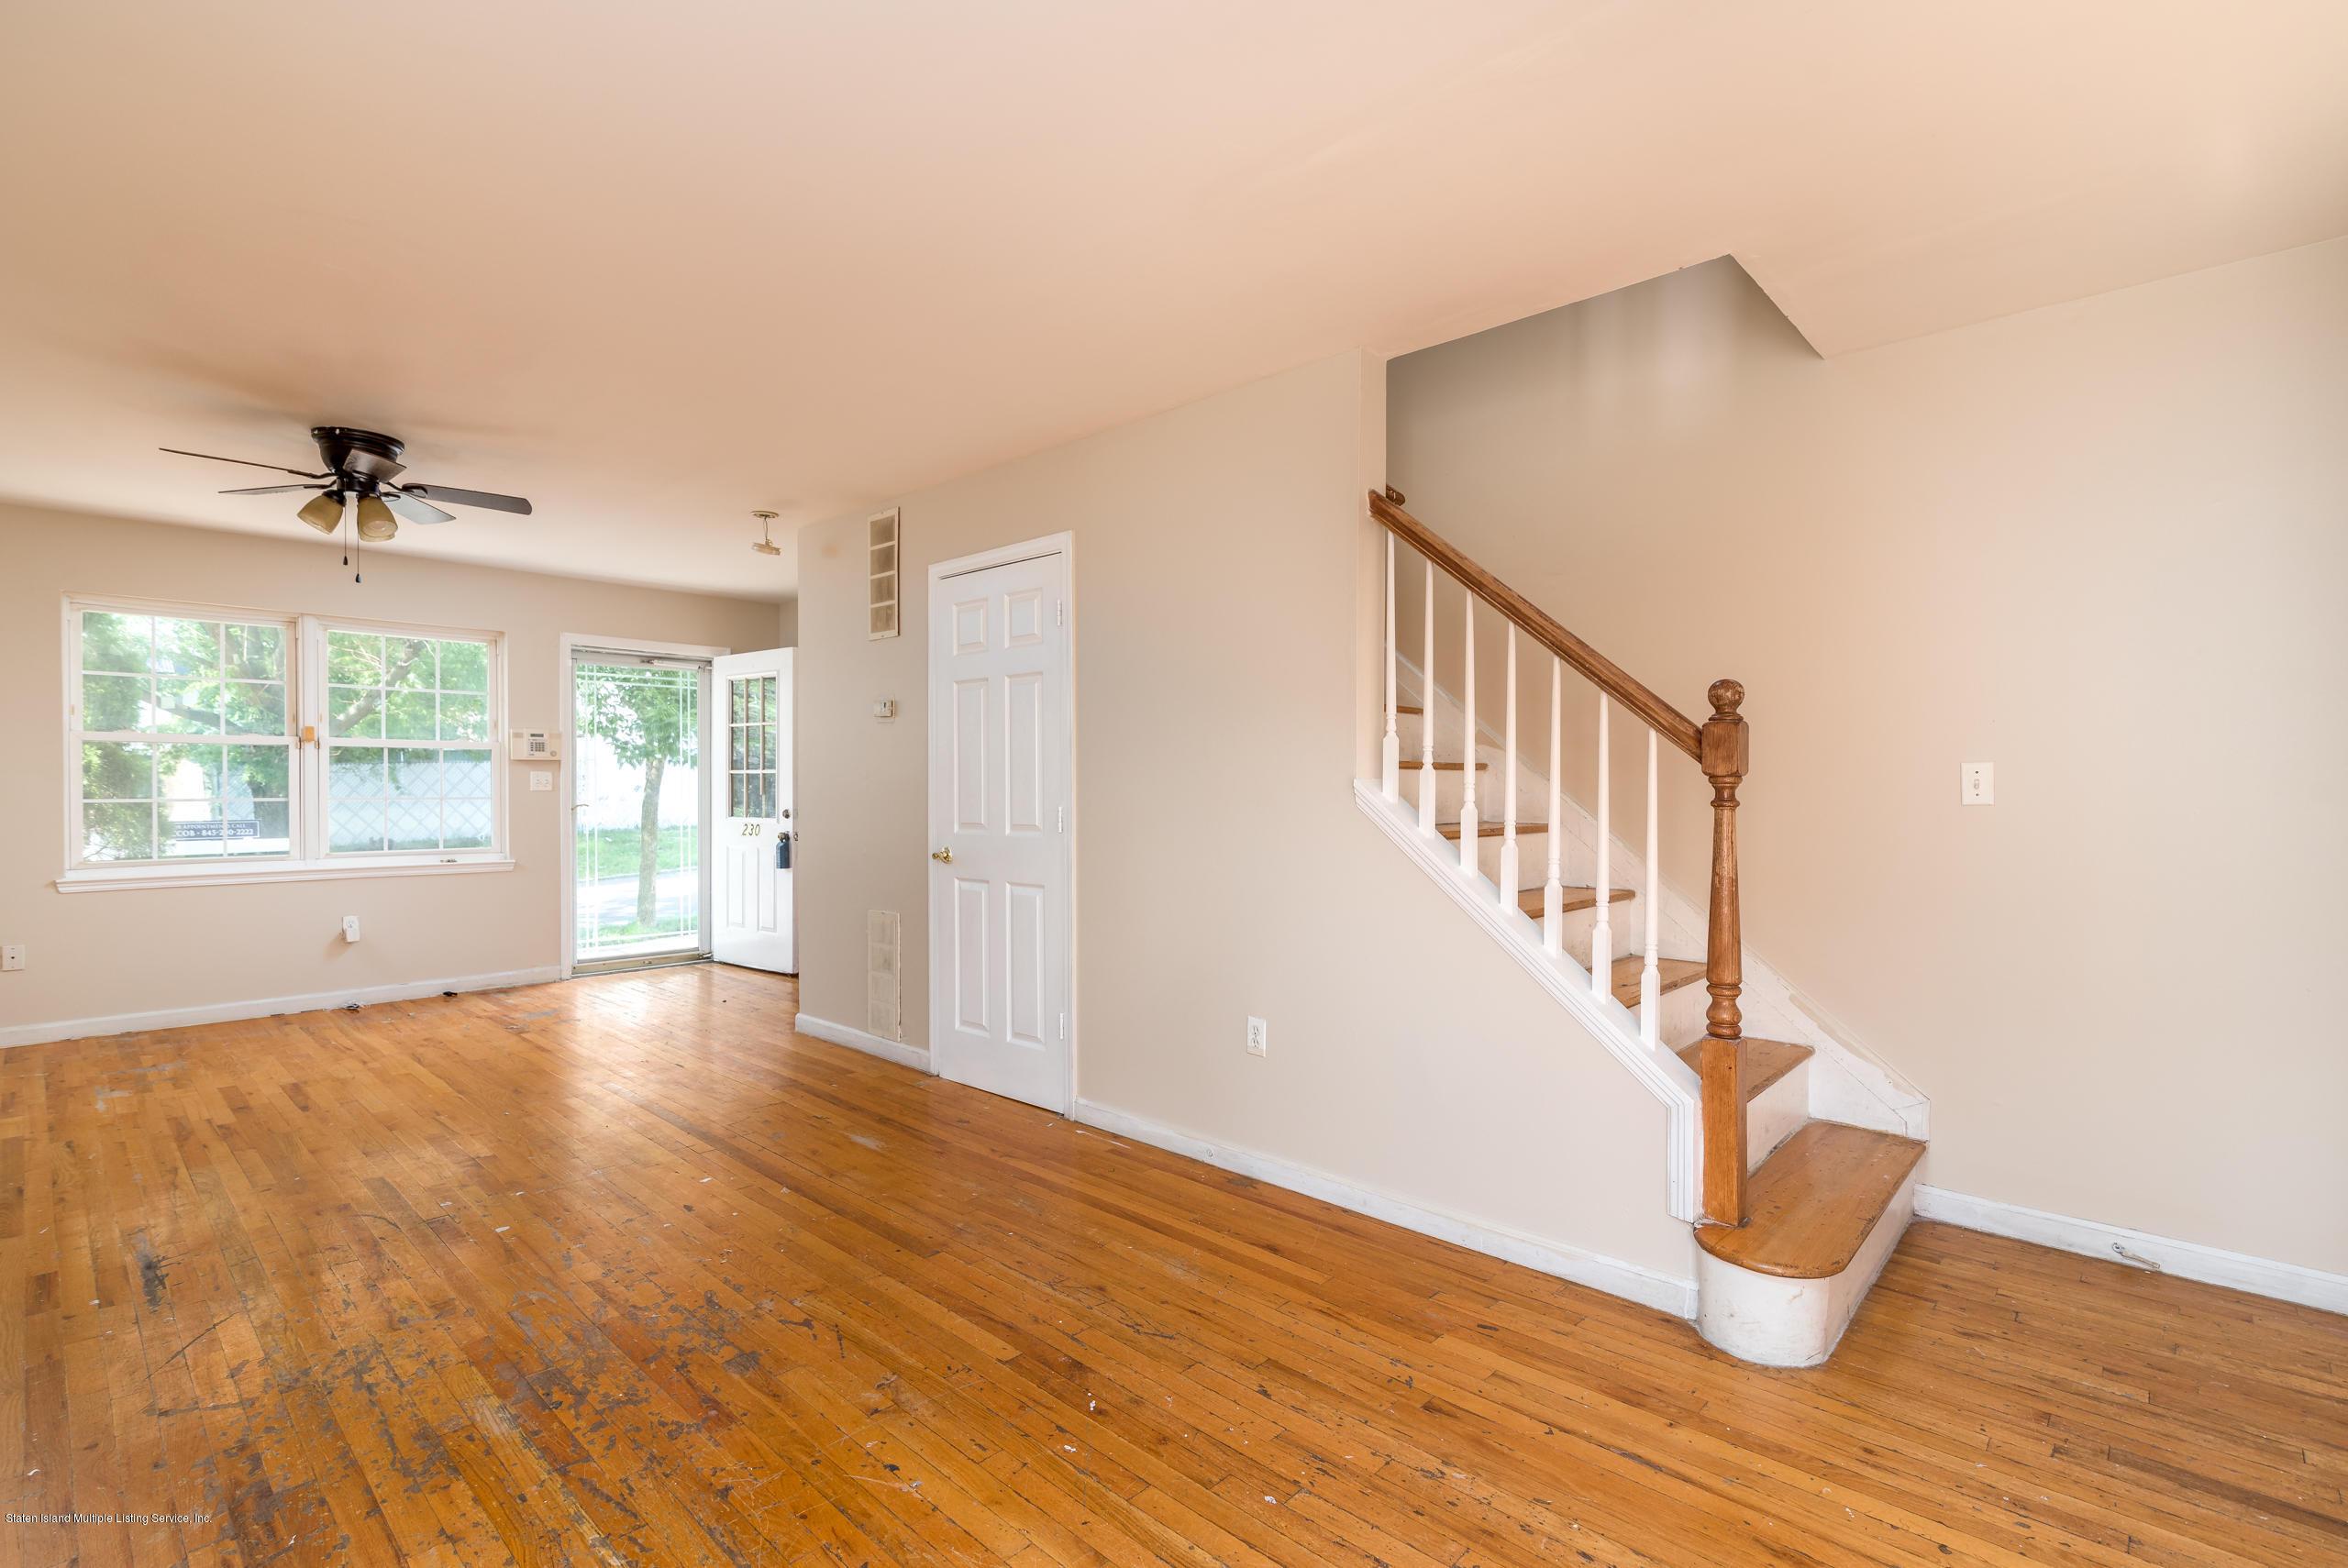 Single Family - Semi-Attached 230 Holden Boulevard  Staten Island, NY 10314, MLS-1130208-13